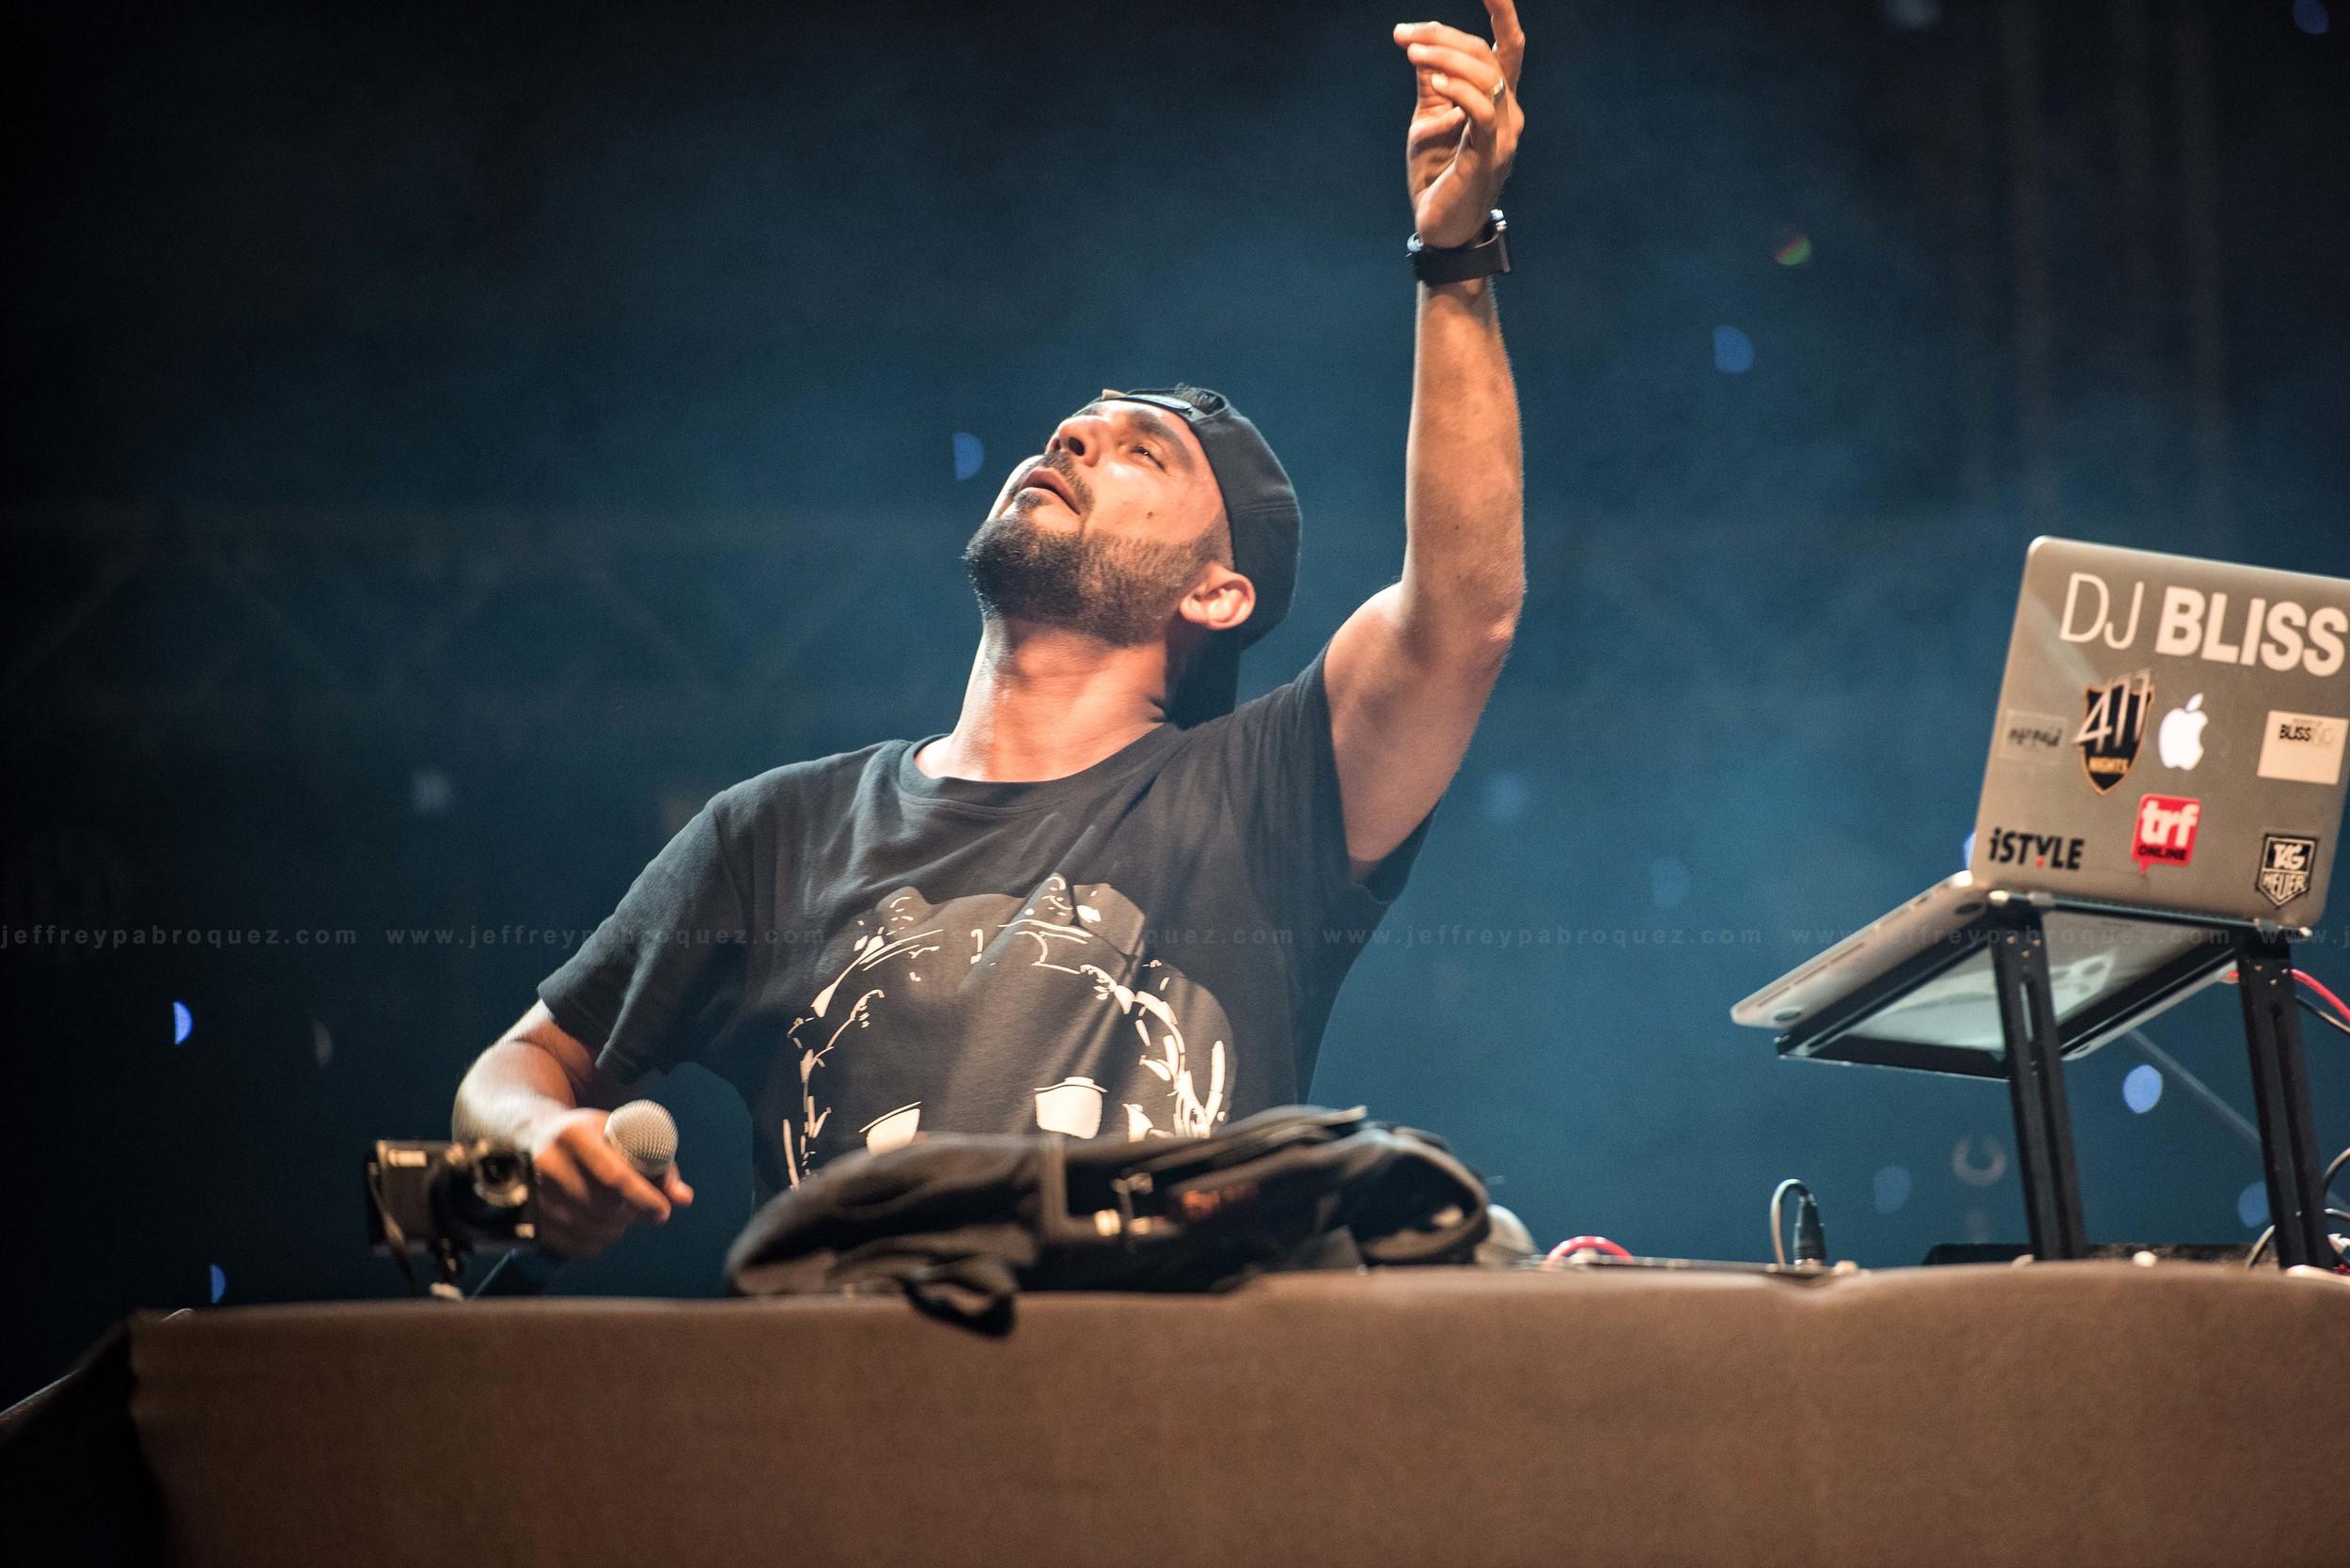 DJ Bliss